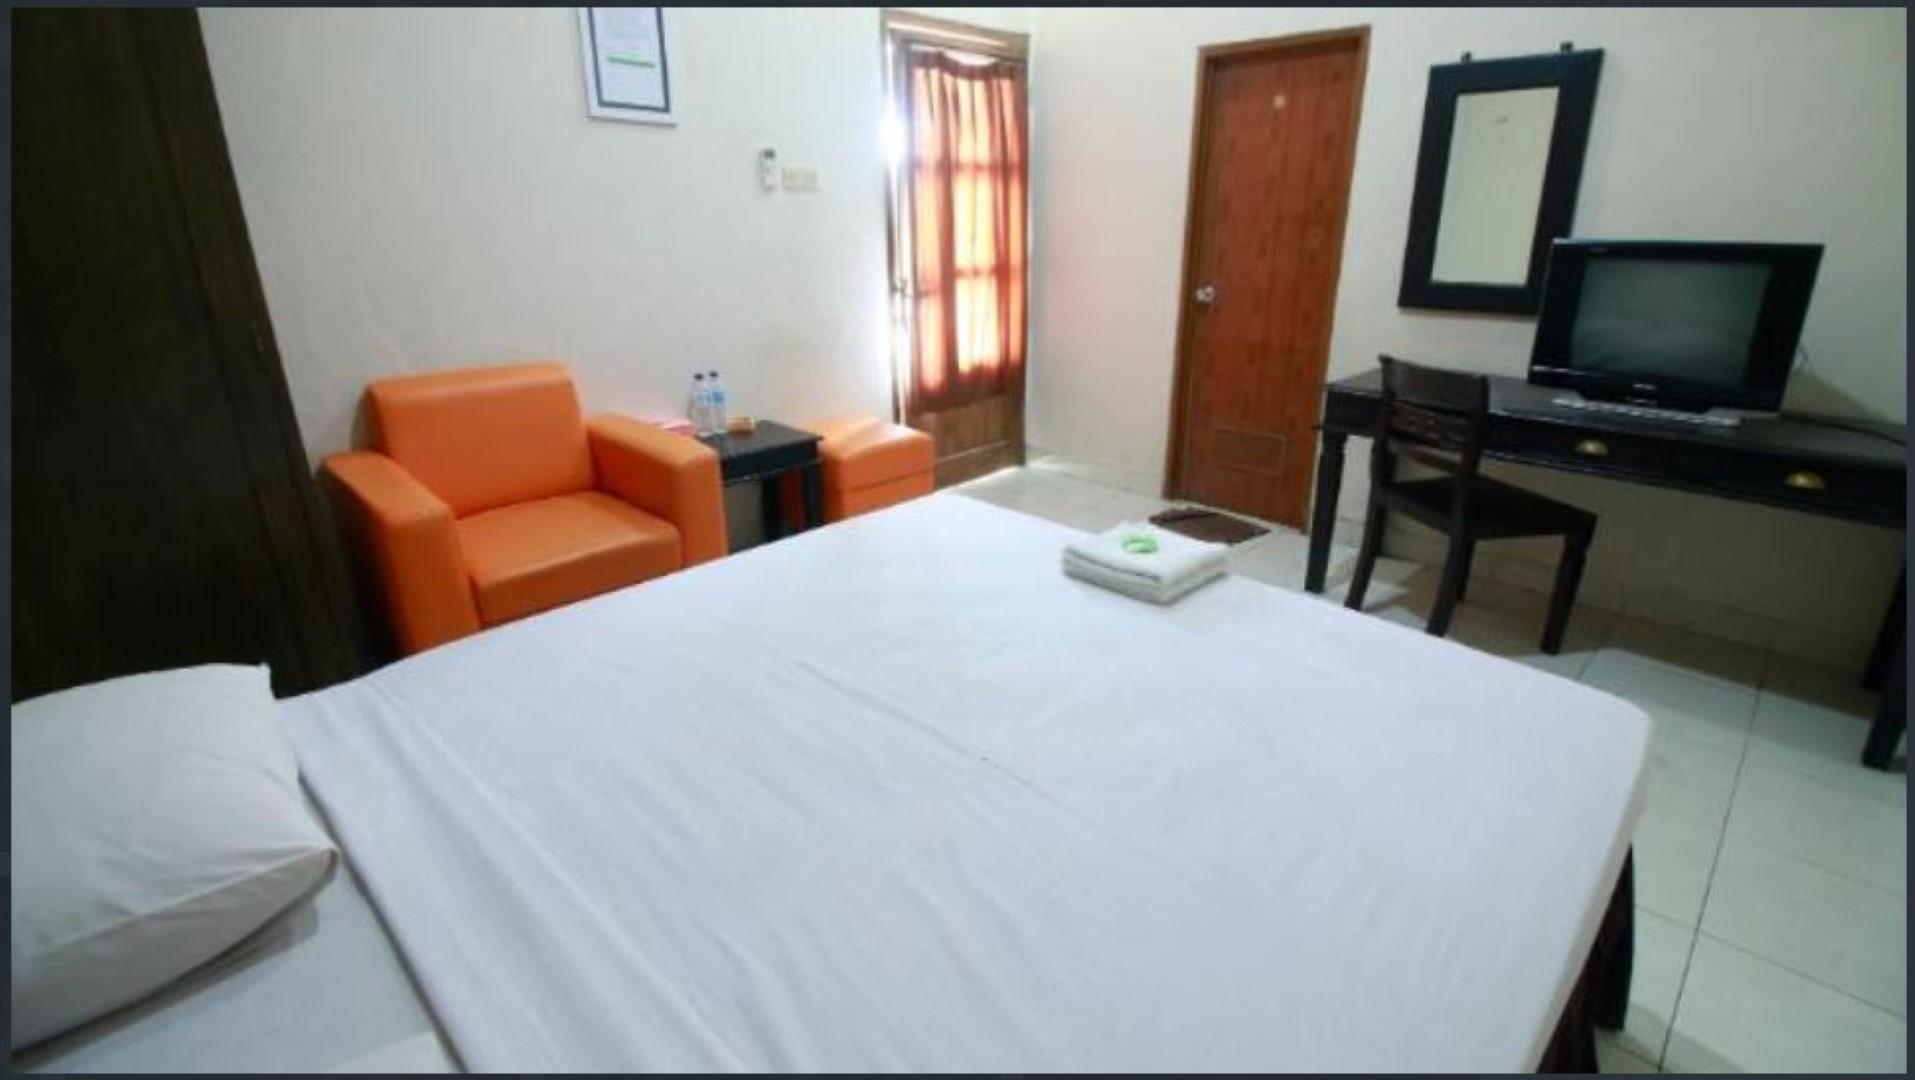 Hotel POPI (Pondok Pisang), Sleman